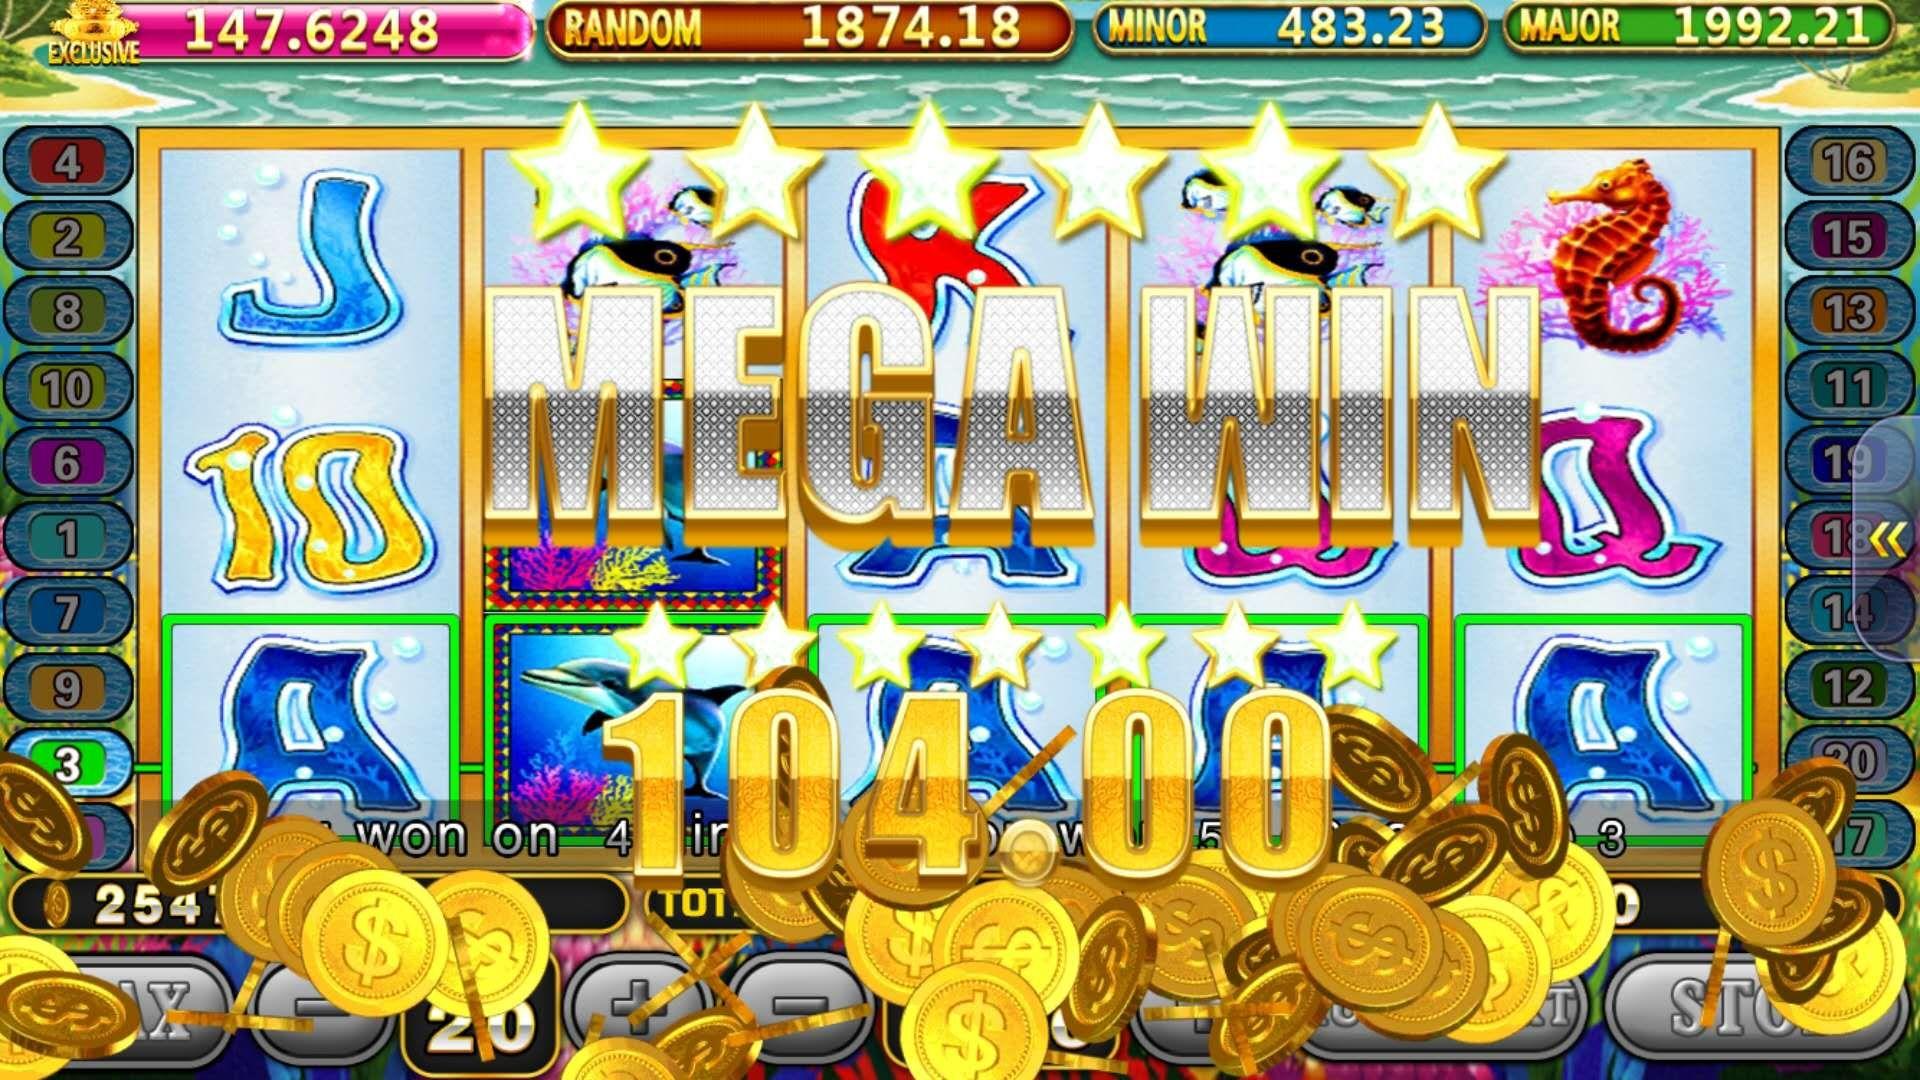 www.uwin88.co 100 trusted company slotcasino slotgame